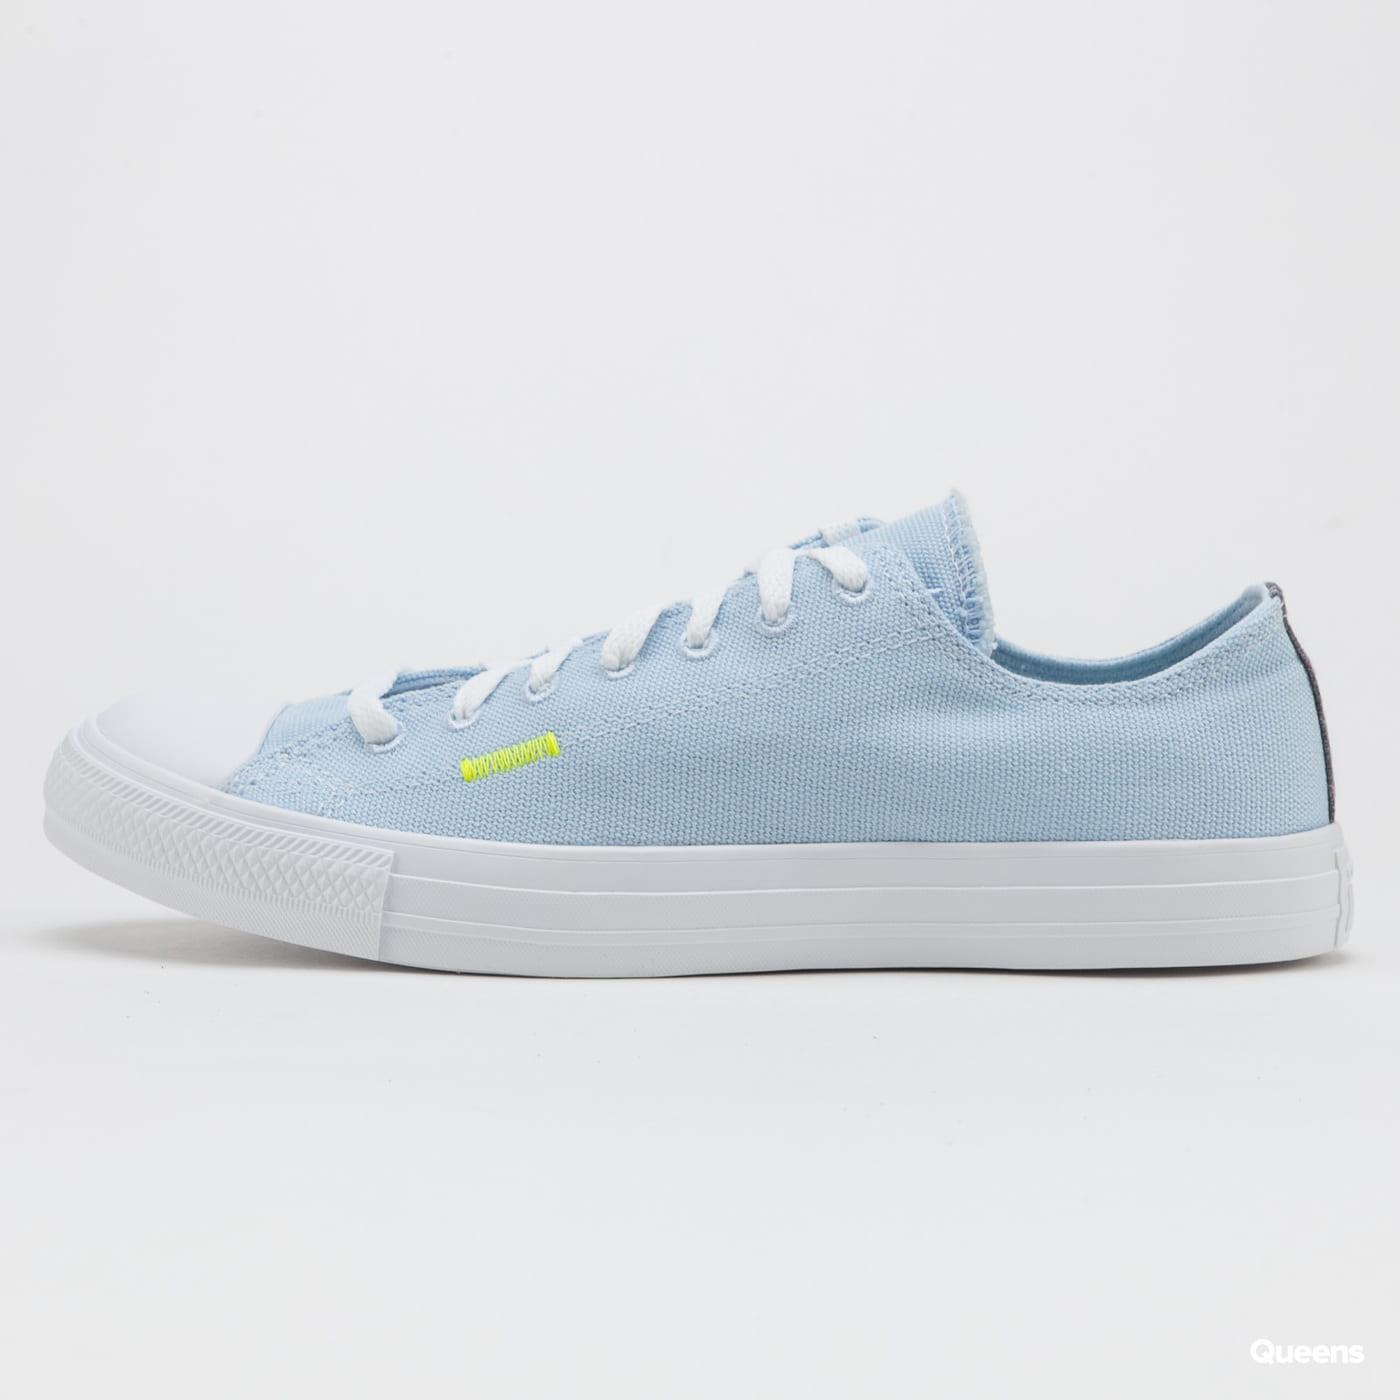 Converse Chuck Taylor All Star OX chambray blue lemon venom